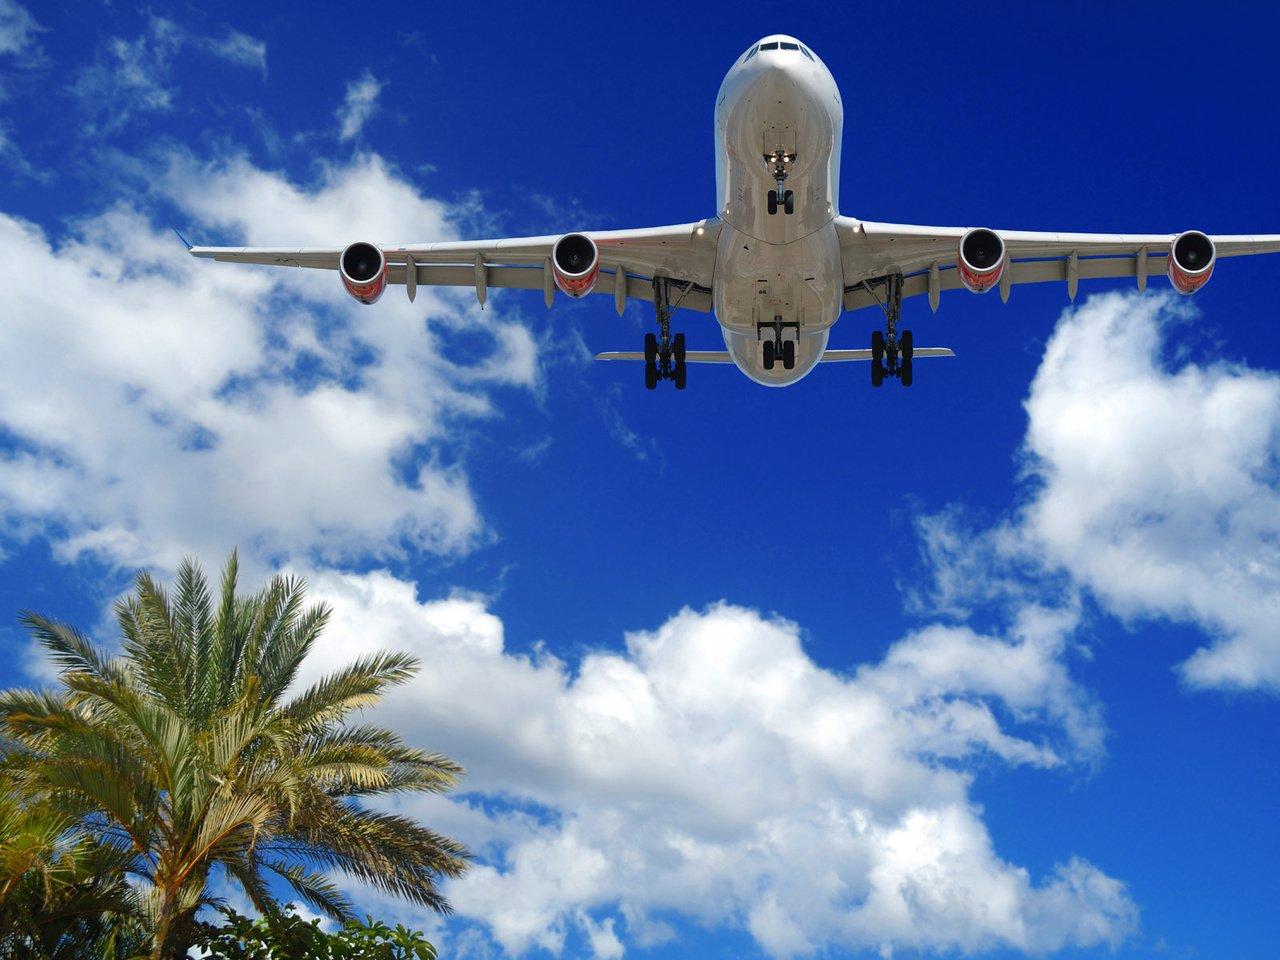 ВСША самолёт вернулся ваэропорт из-за птицы наборту